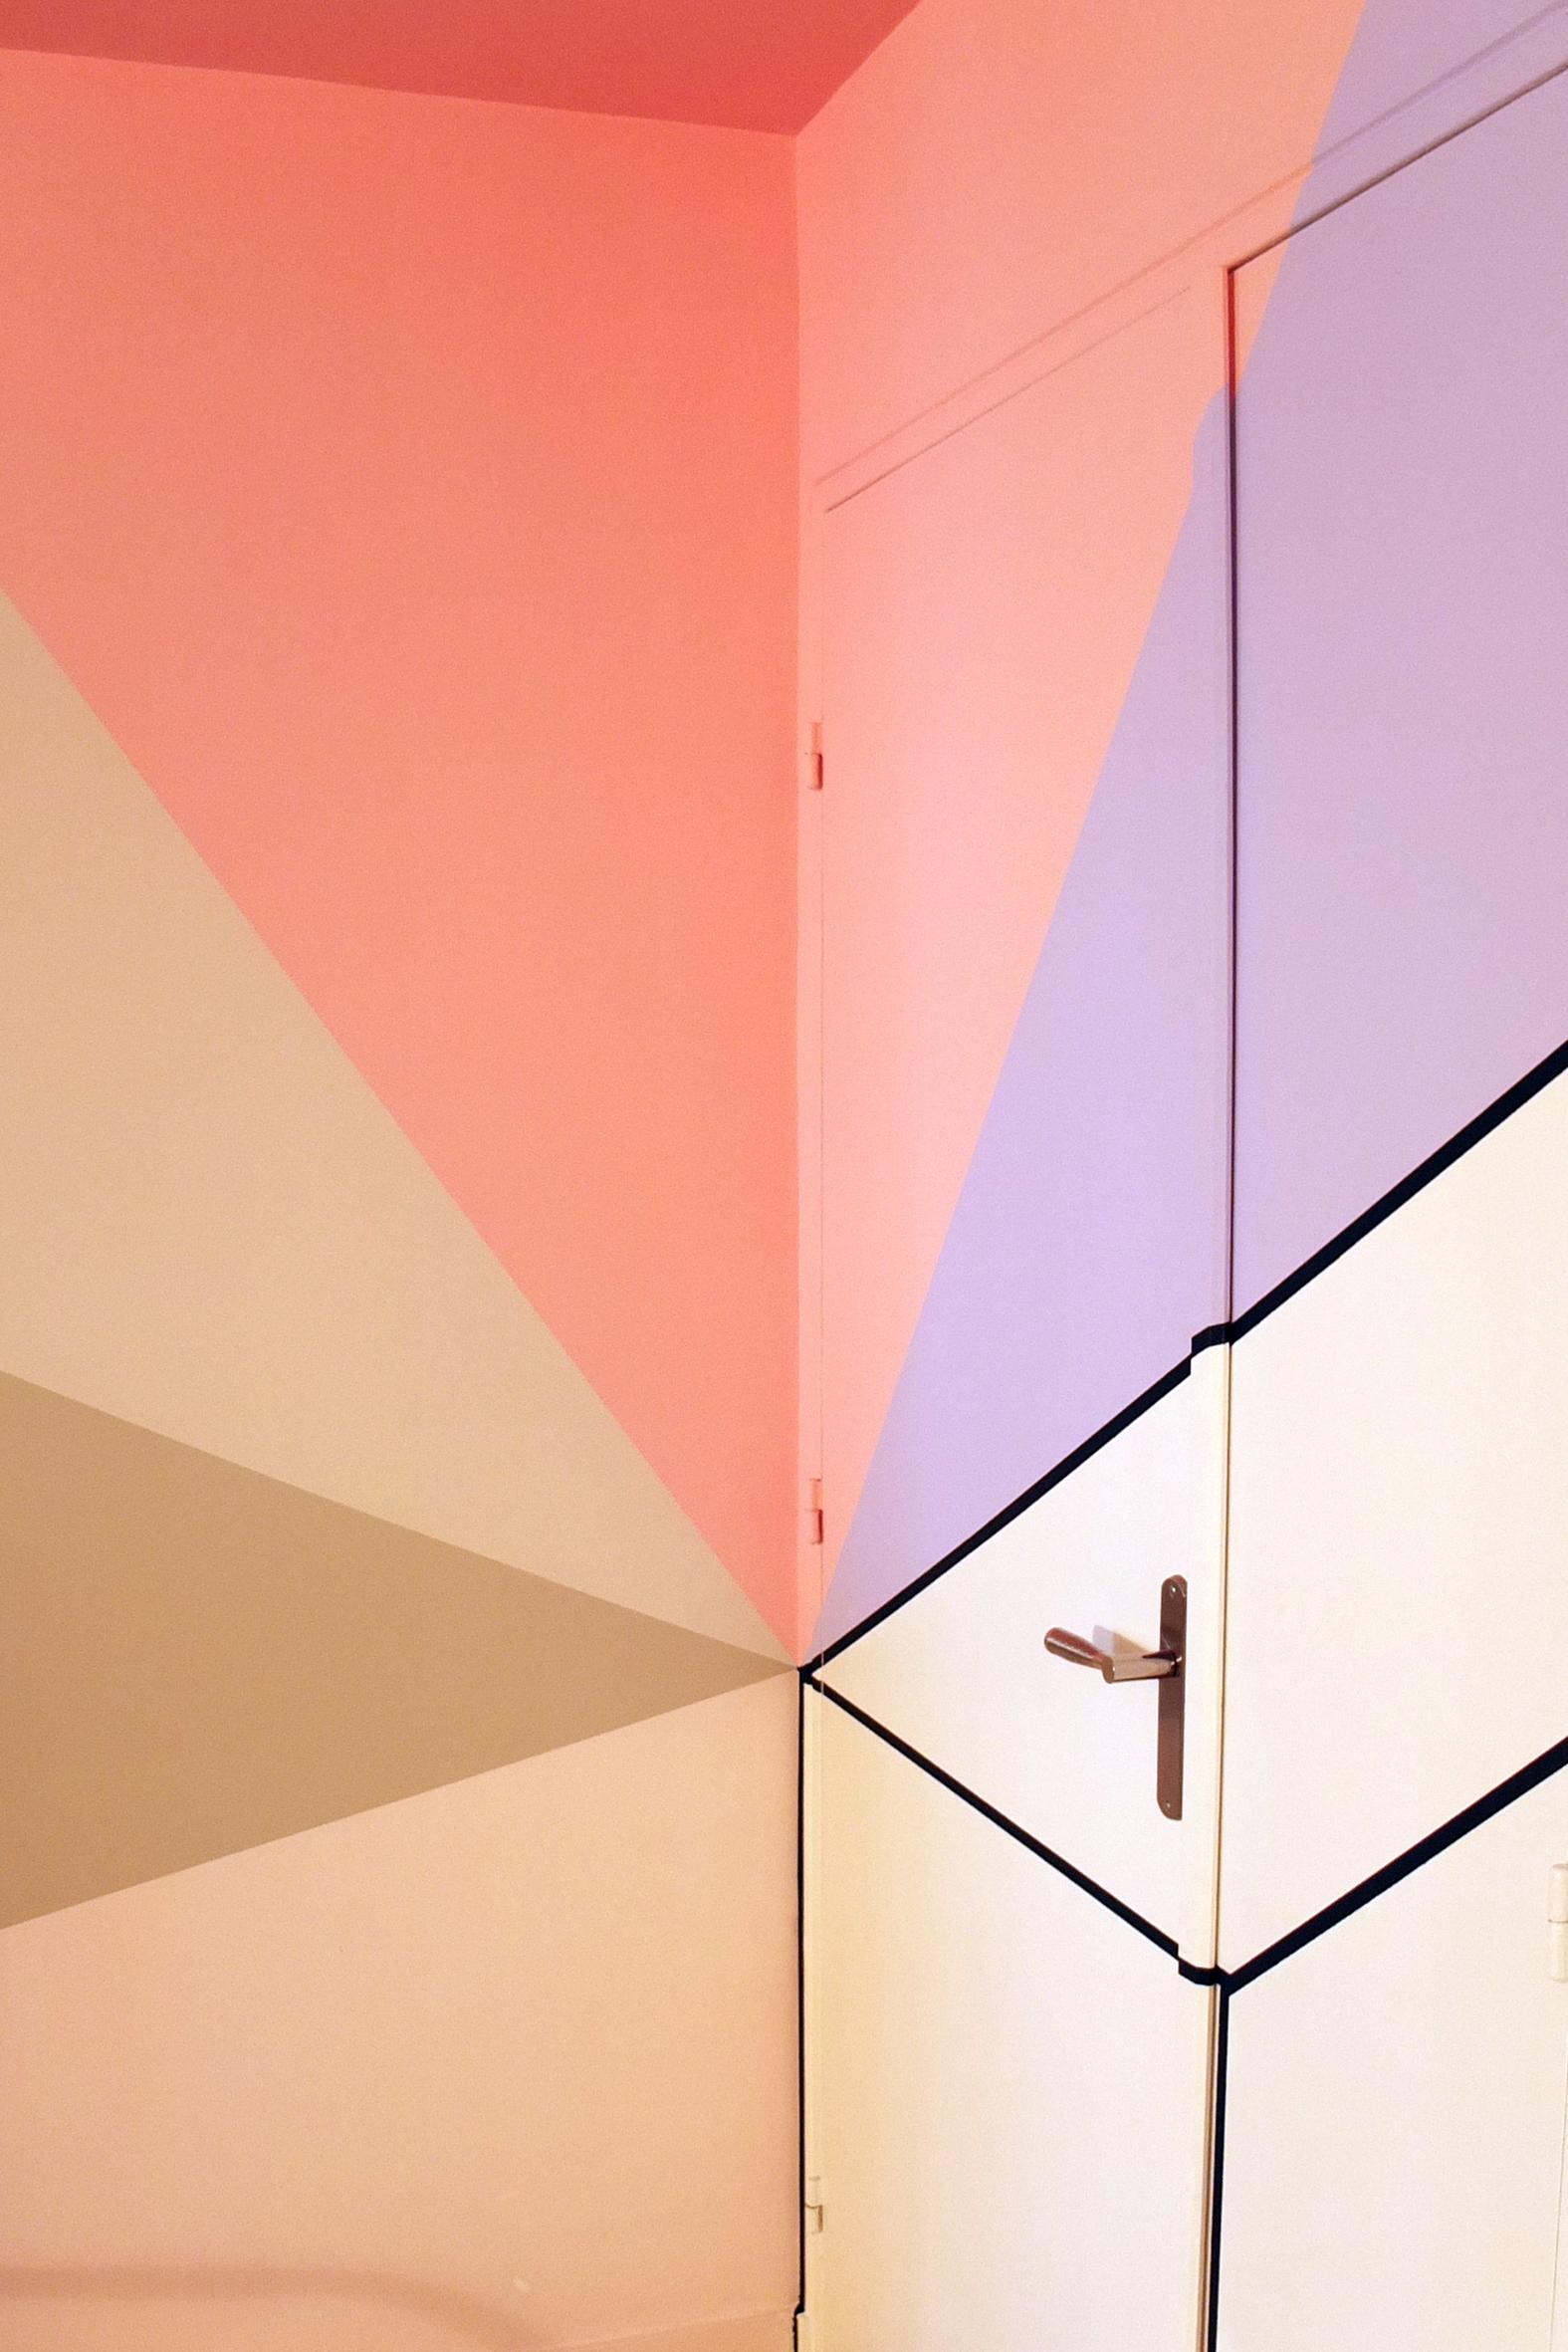 Prism #10 (wallsandwonders.com)